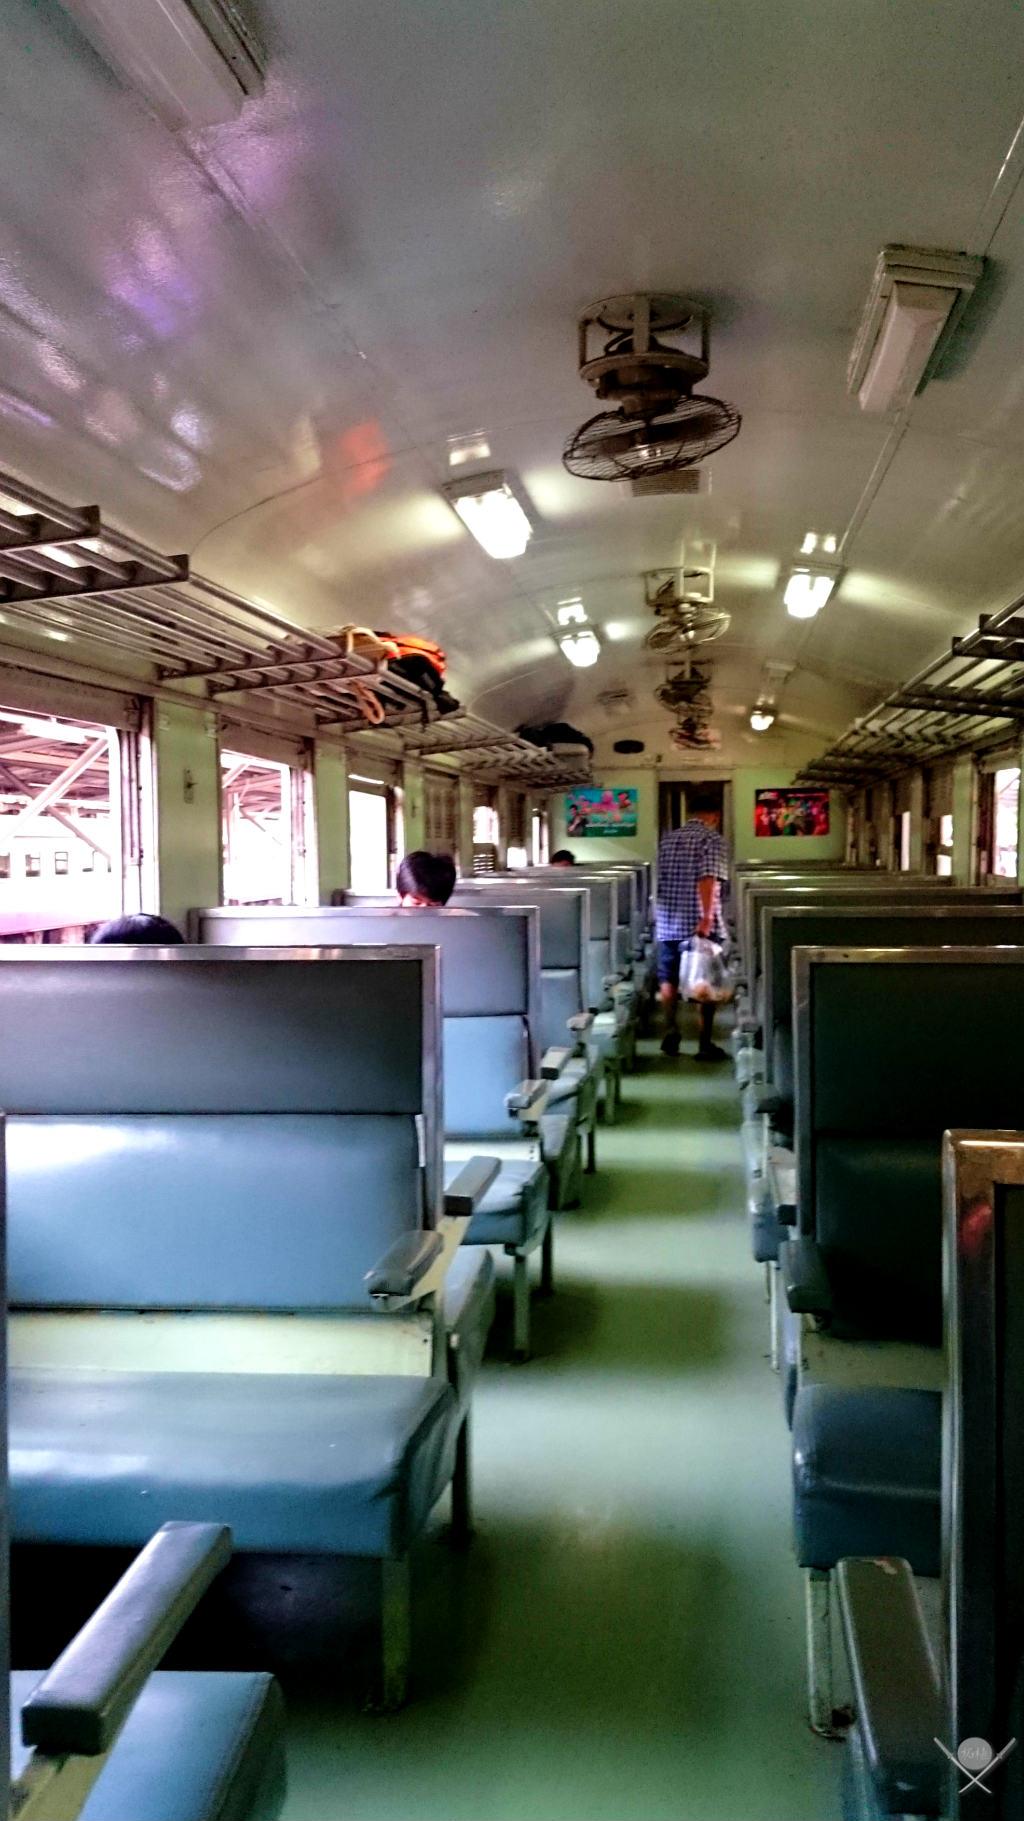 Thailand Ayutthaya Trem 2 Vida de Tsuge VDT 1024x1820